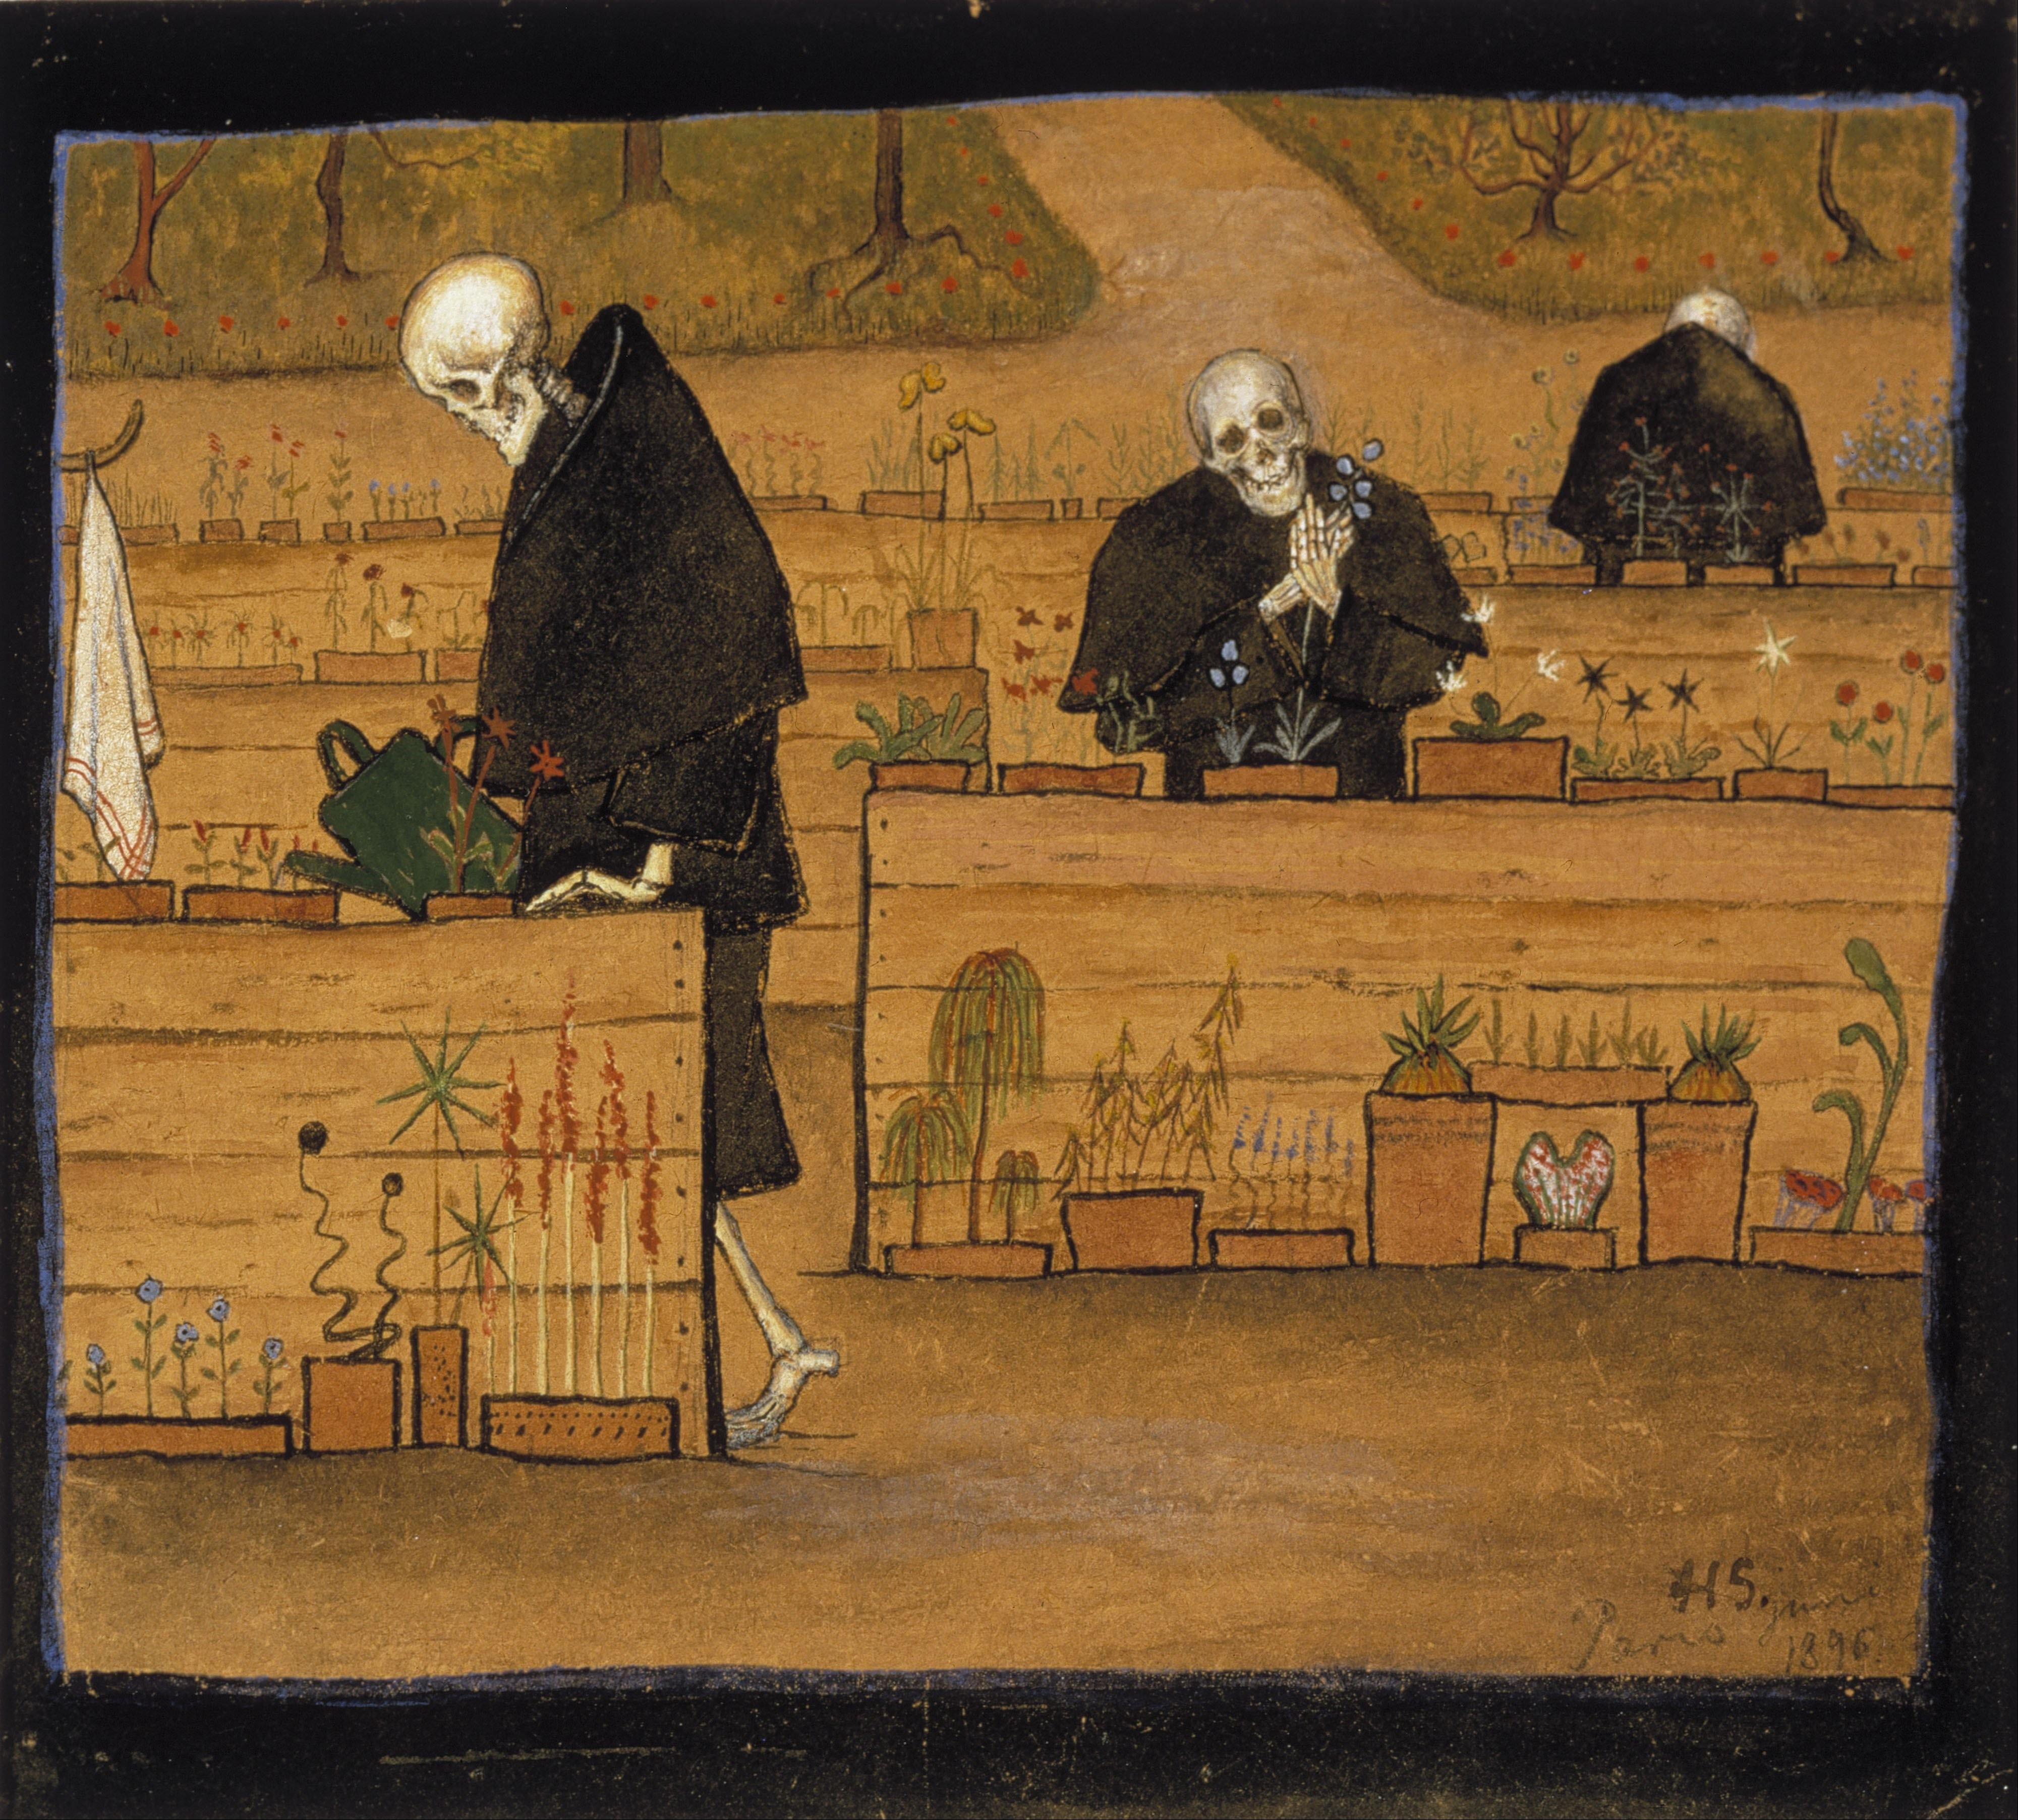 Hugo_Simberg_-_The_Garden_of_Death_-_Google_Art_Project